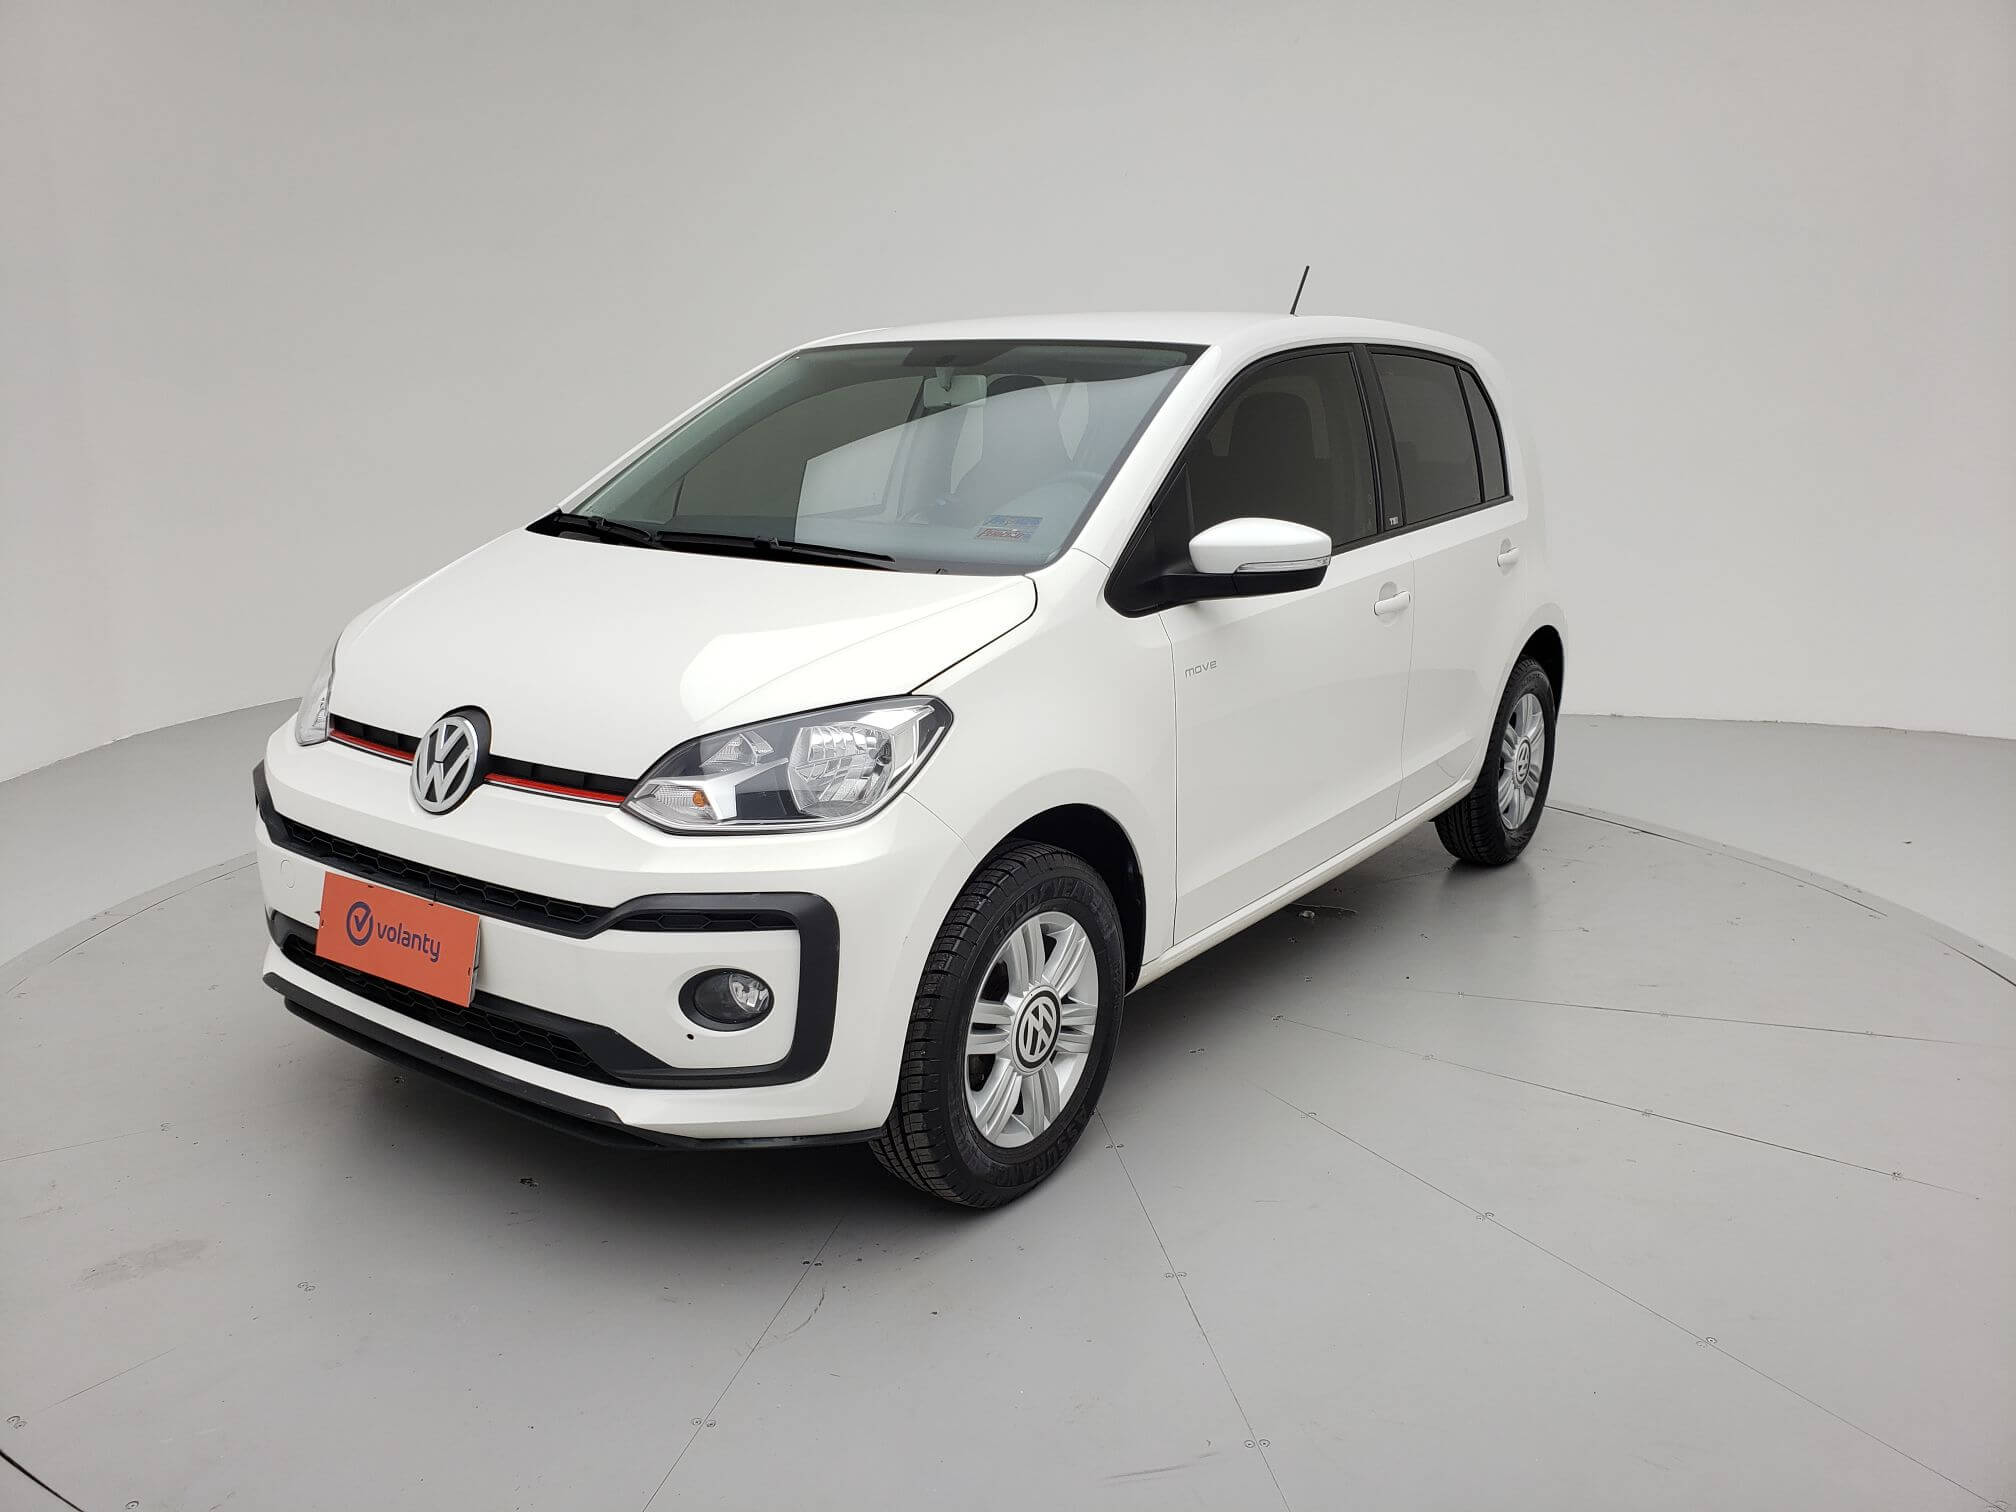 Imagem do Volkswagen Up